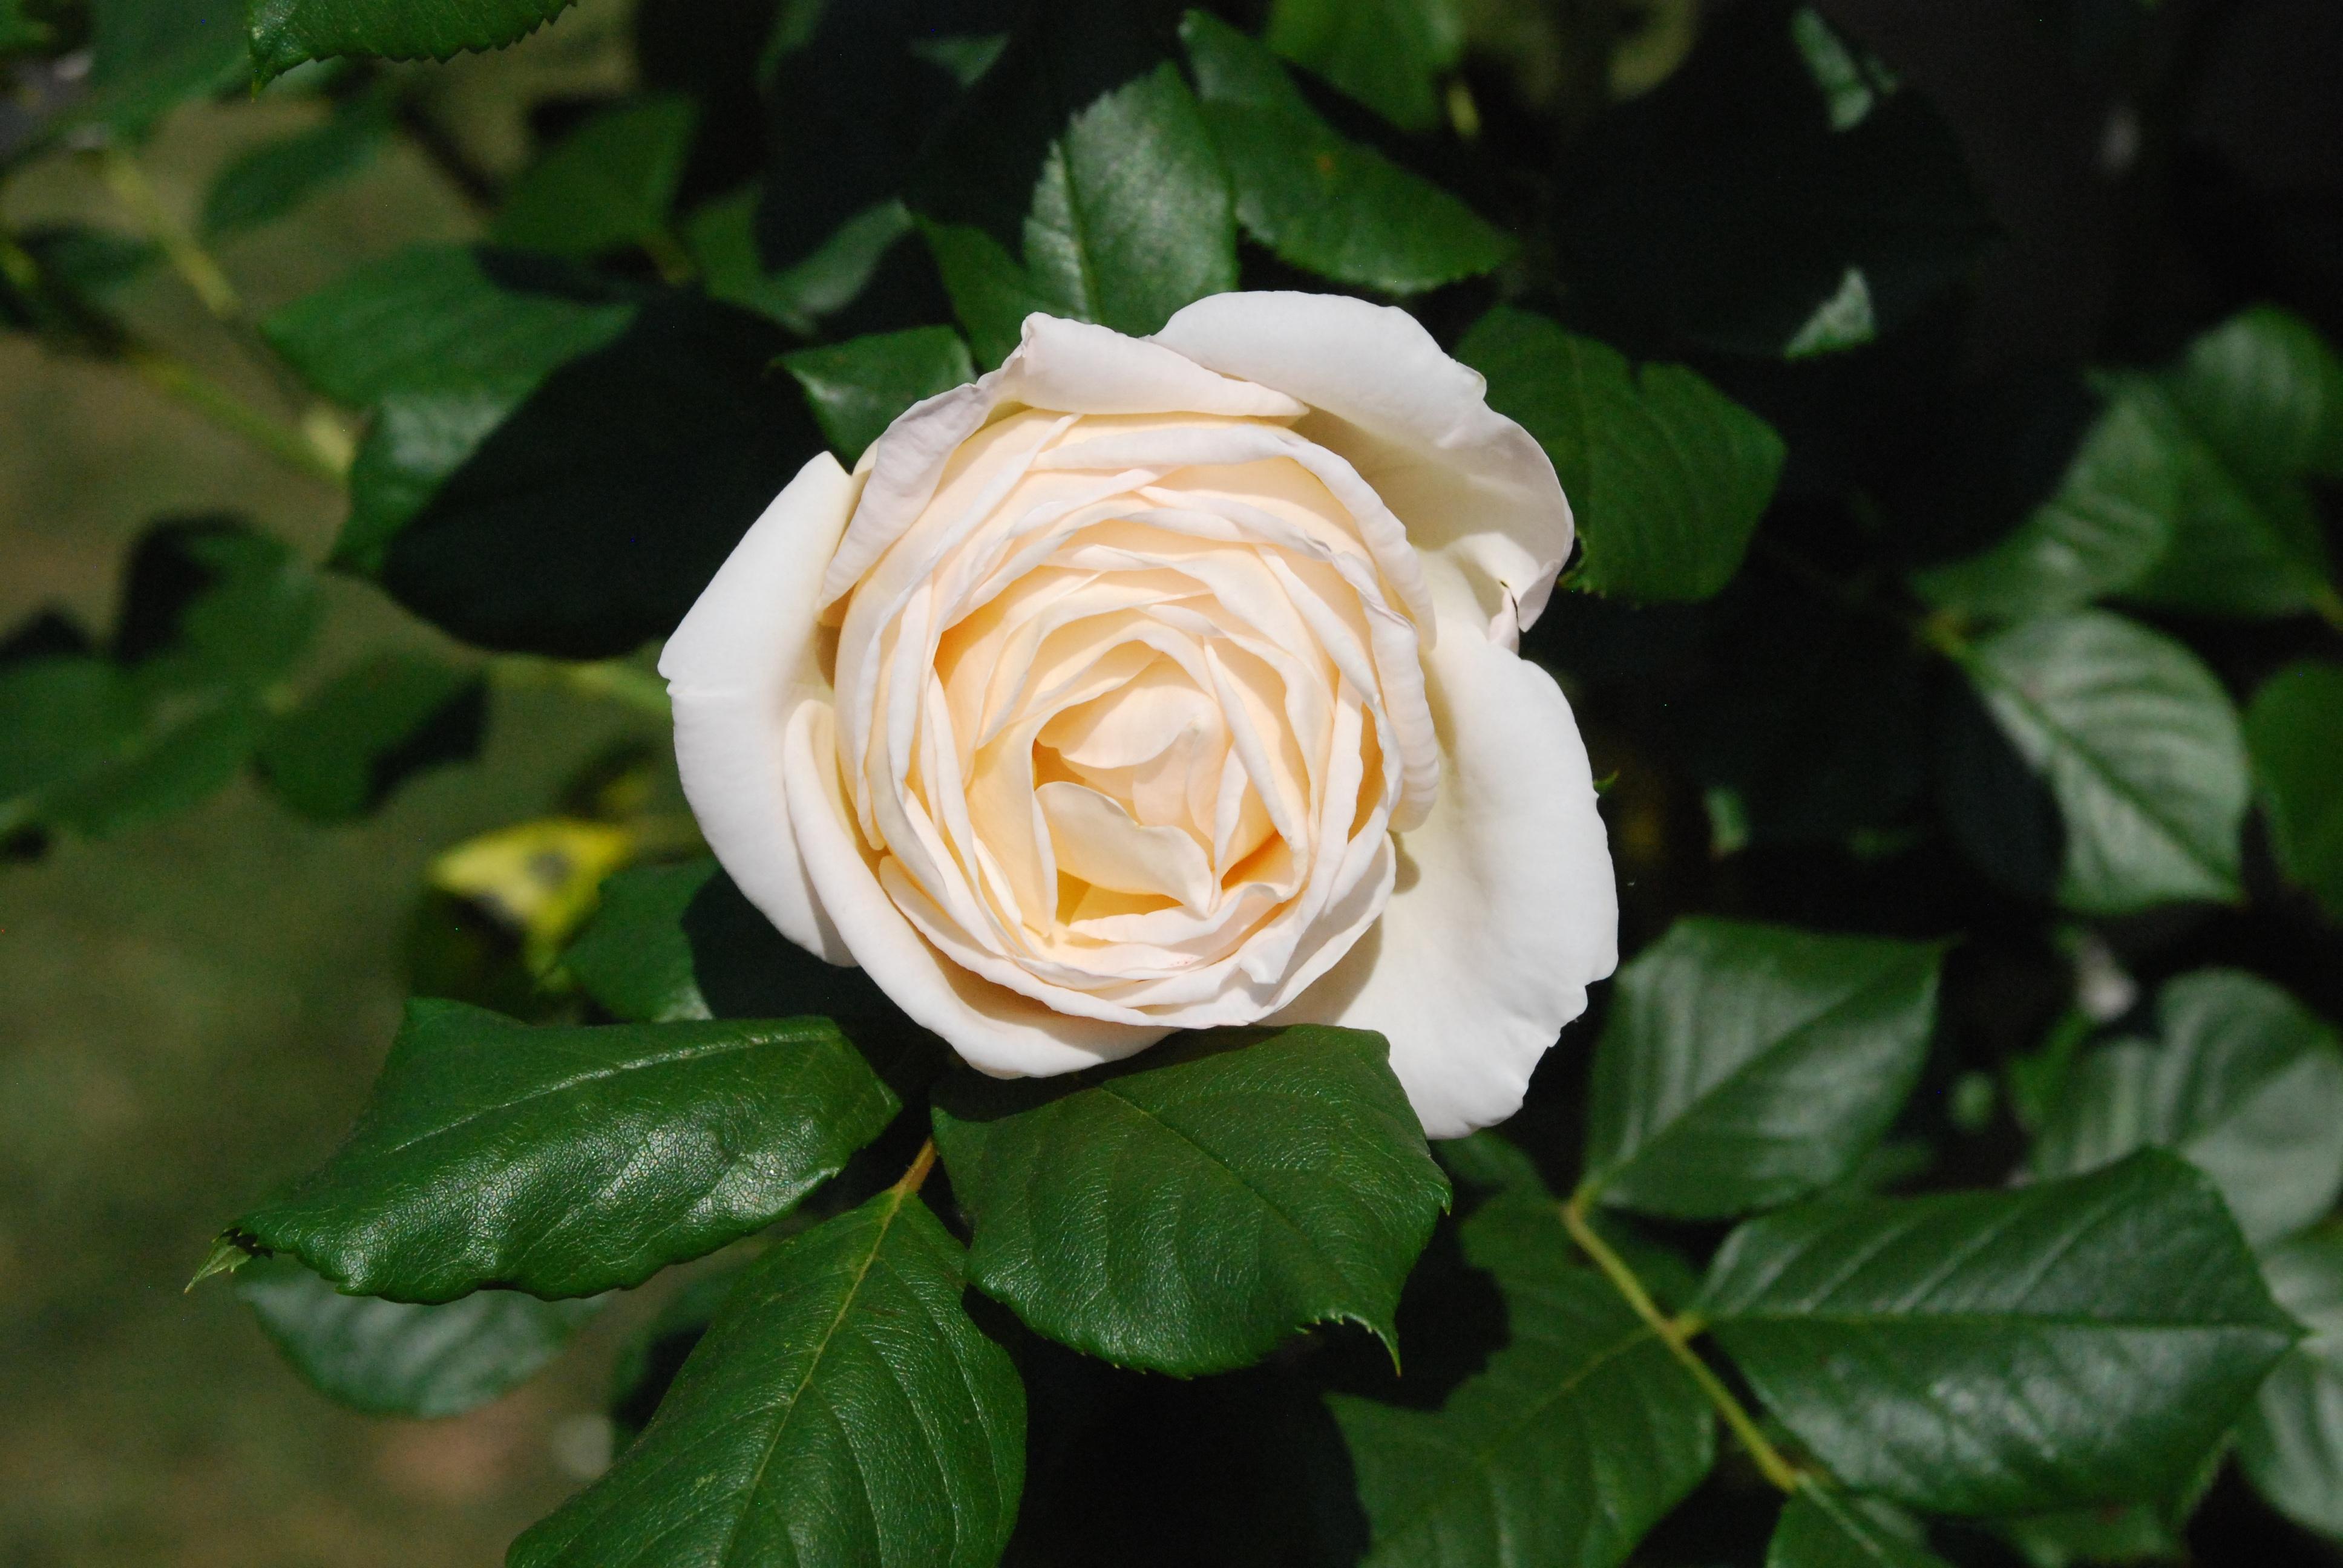 Gambar menanam daun bunga berkembang hijau botani dekat flora belukar keindahan harum floribunda naik mekar mawar putih tanaman berbunga